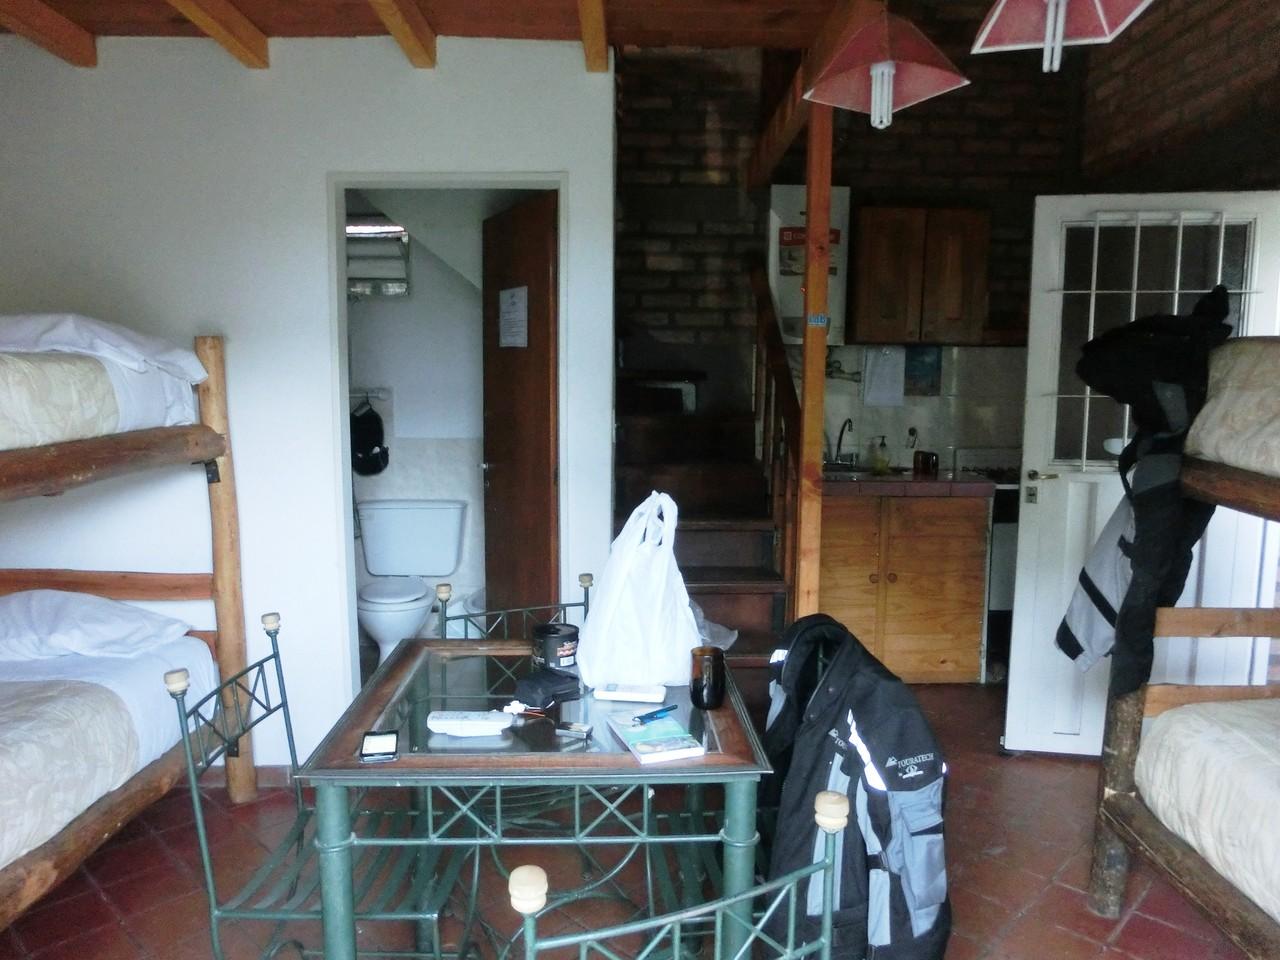 Unsere Unterkunft in La Rioja EG